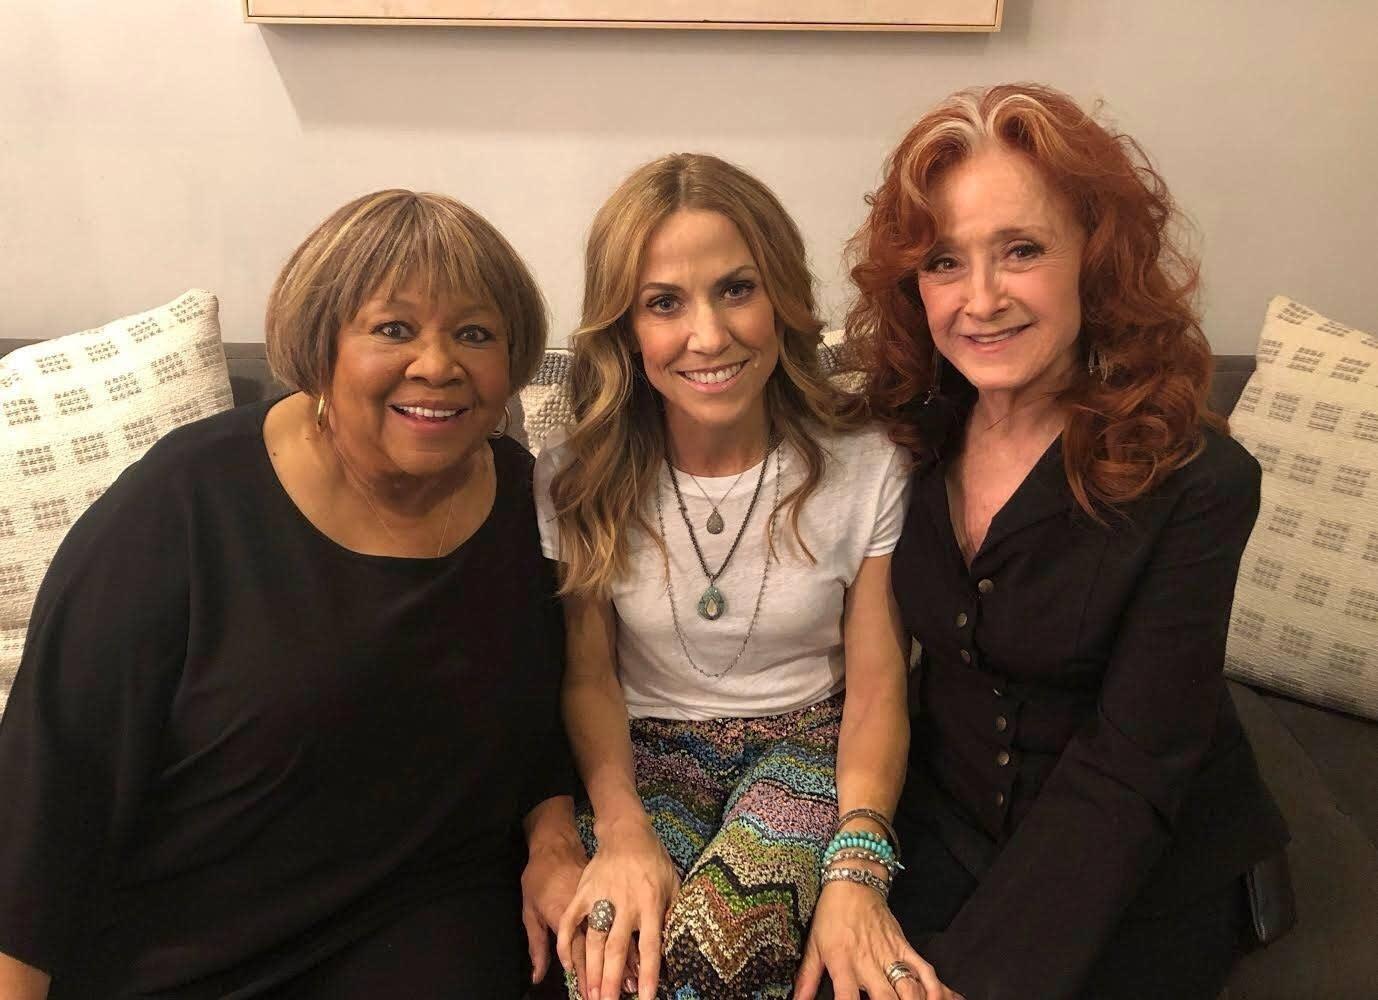 Mavis Staples, Sheryl Crow and Bonnie Raitt at The Ellen Show